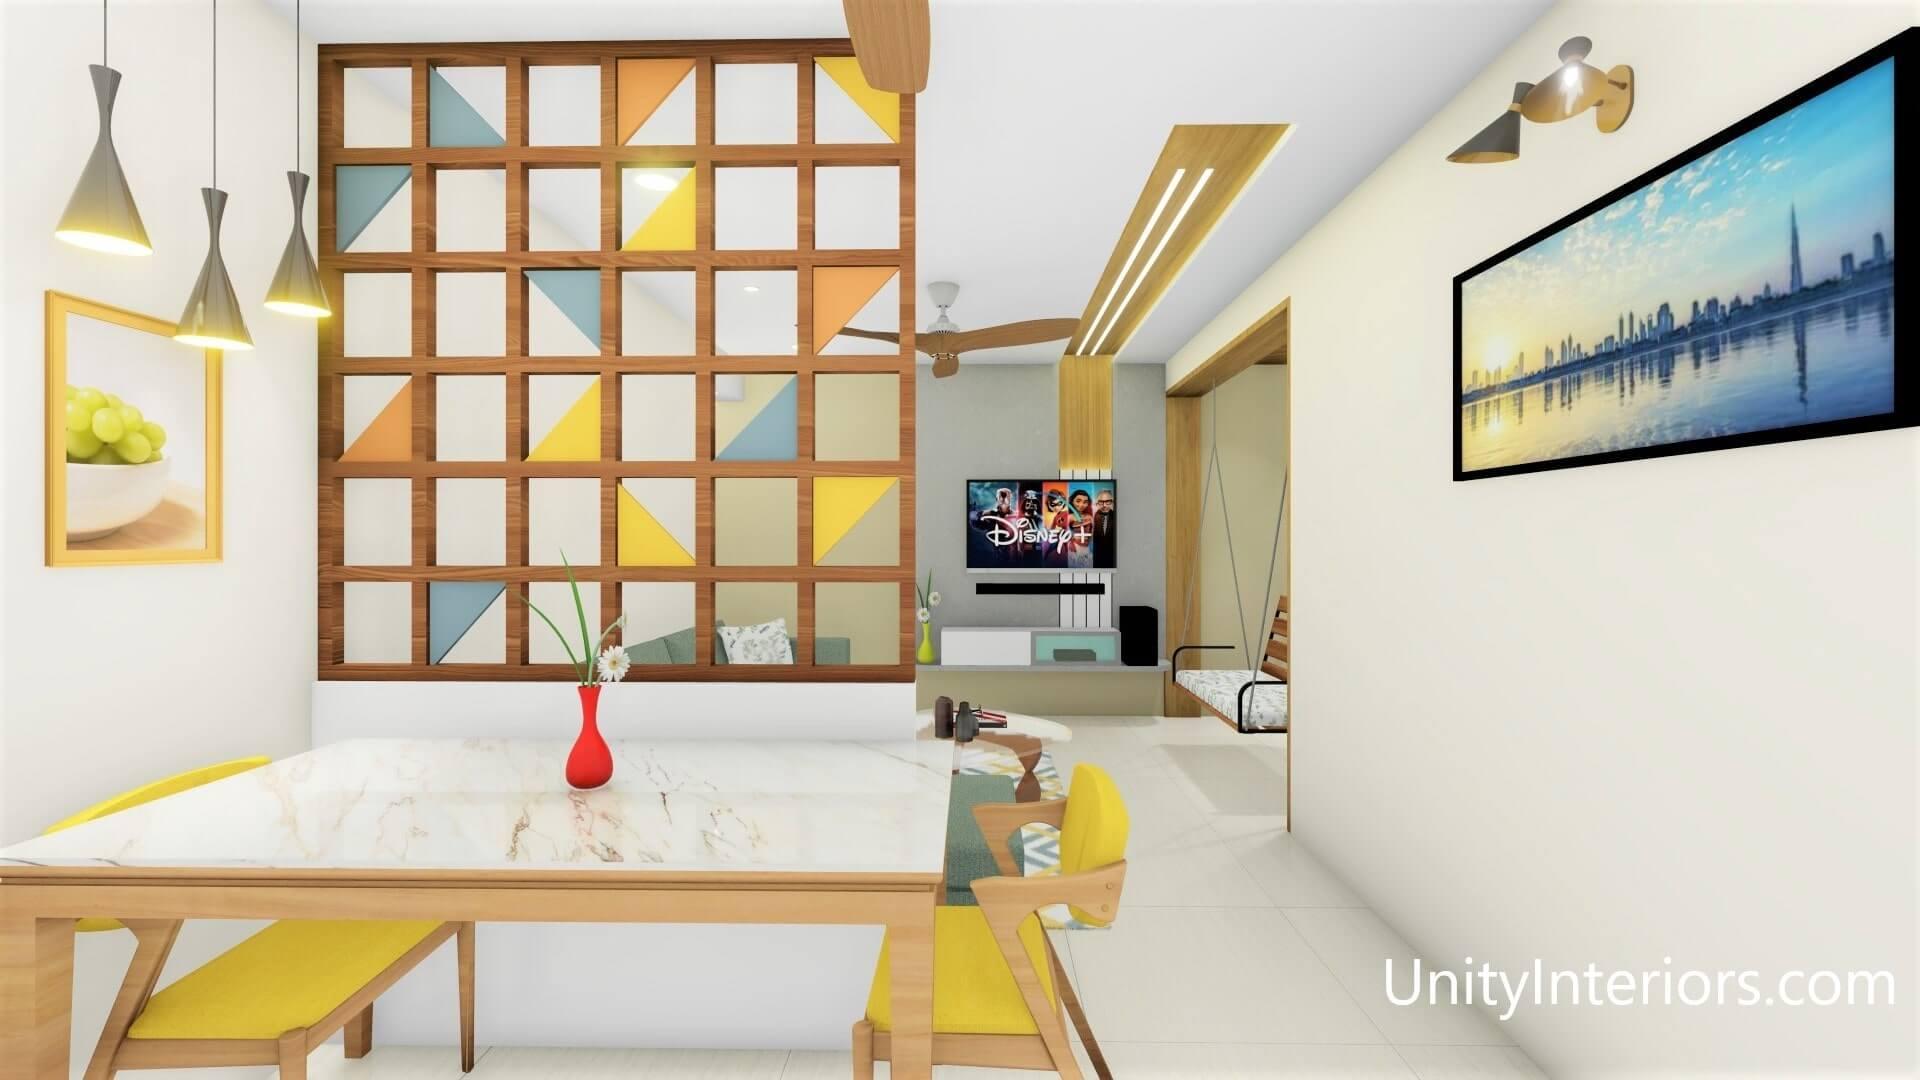 Interior Designer in Ahmedabad, Living room Design Ideas, Unity Interiors, Interior designing in budget